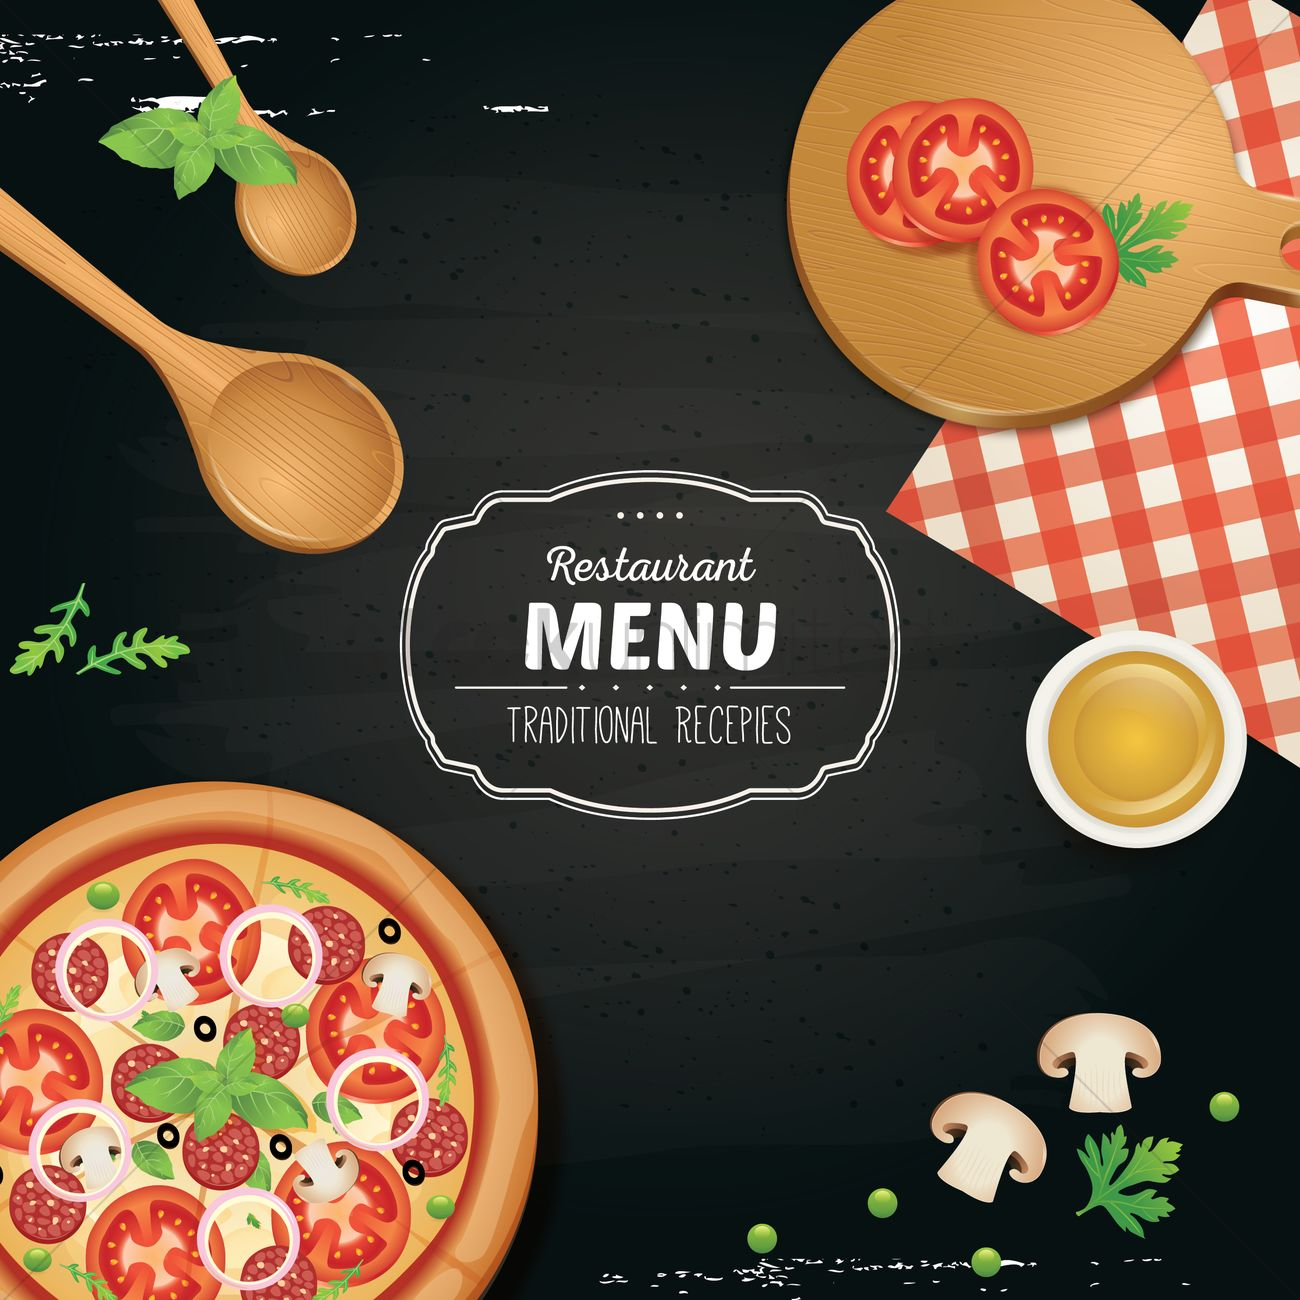 restaurant menu wallpaper vector image 1807875